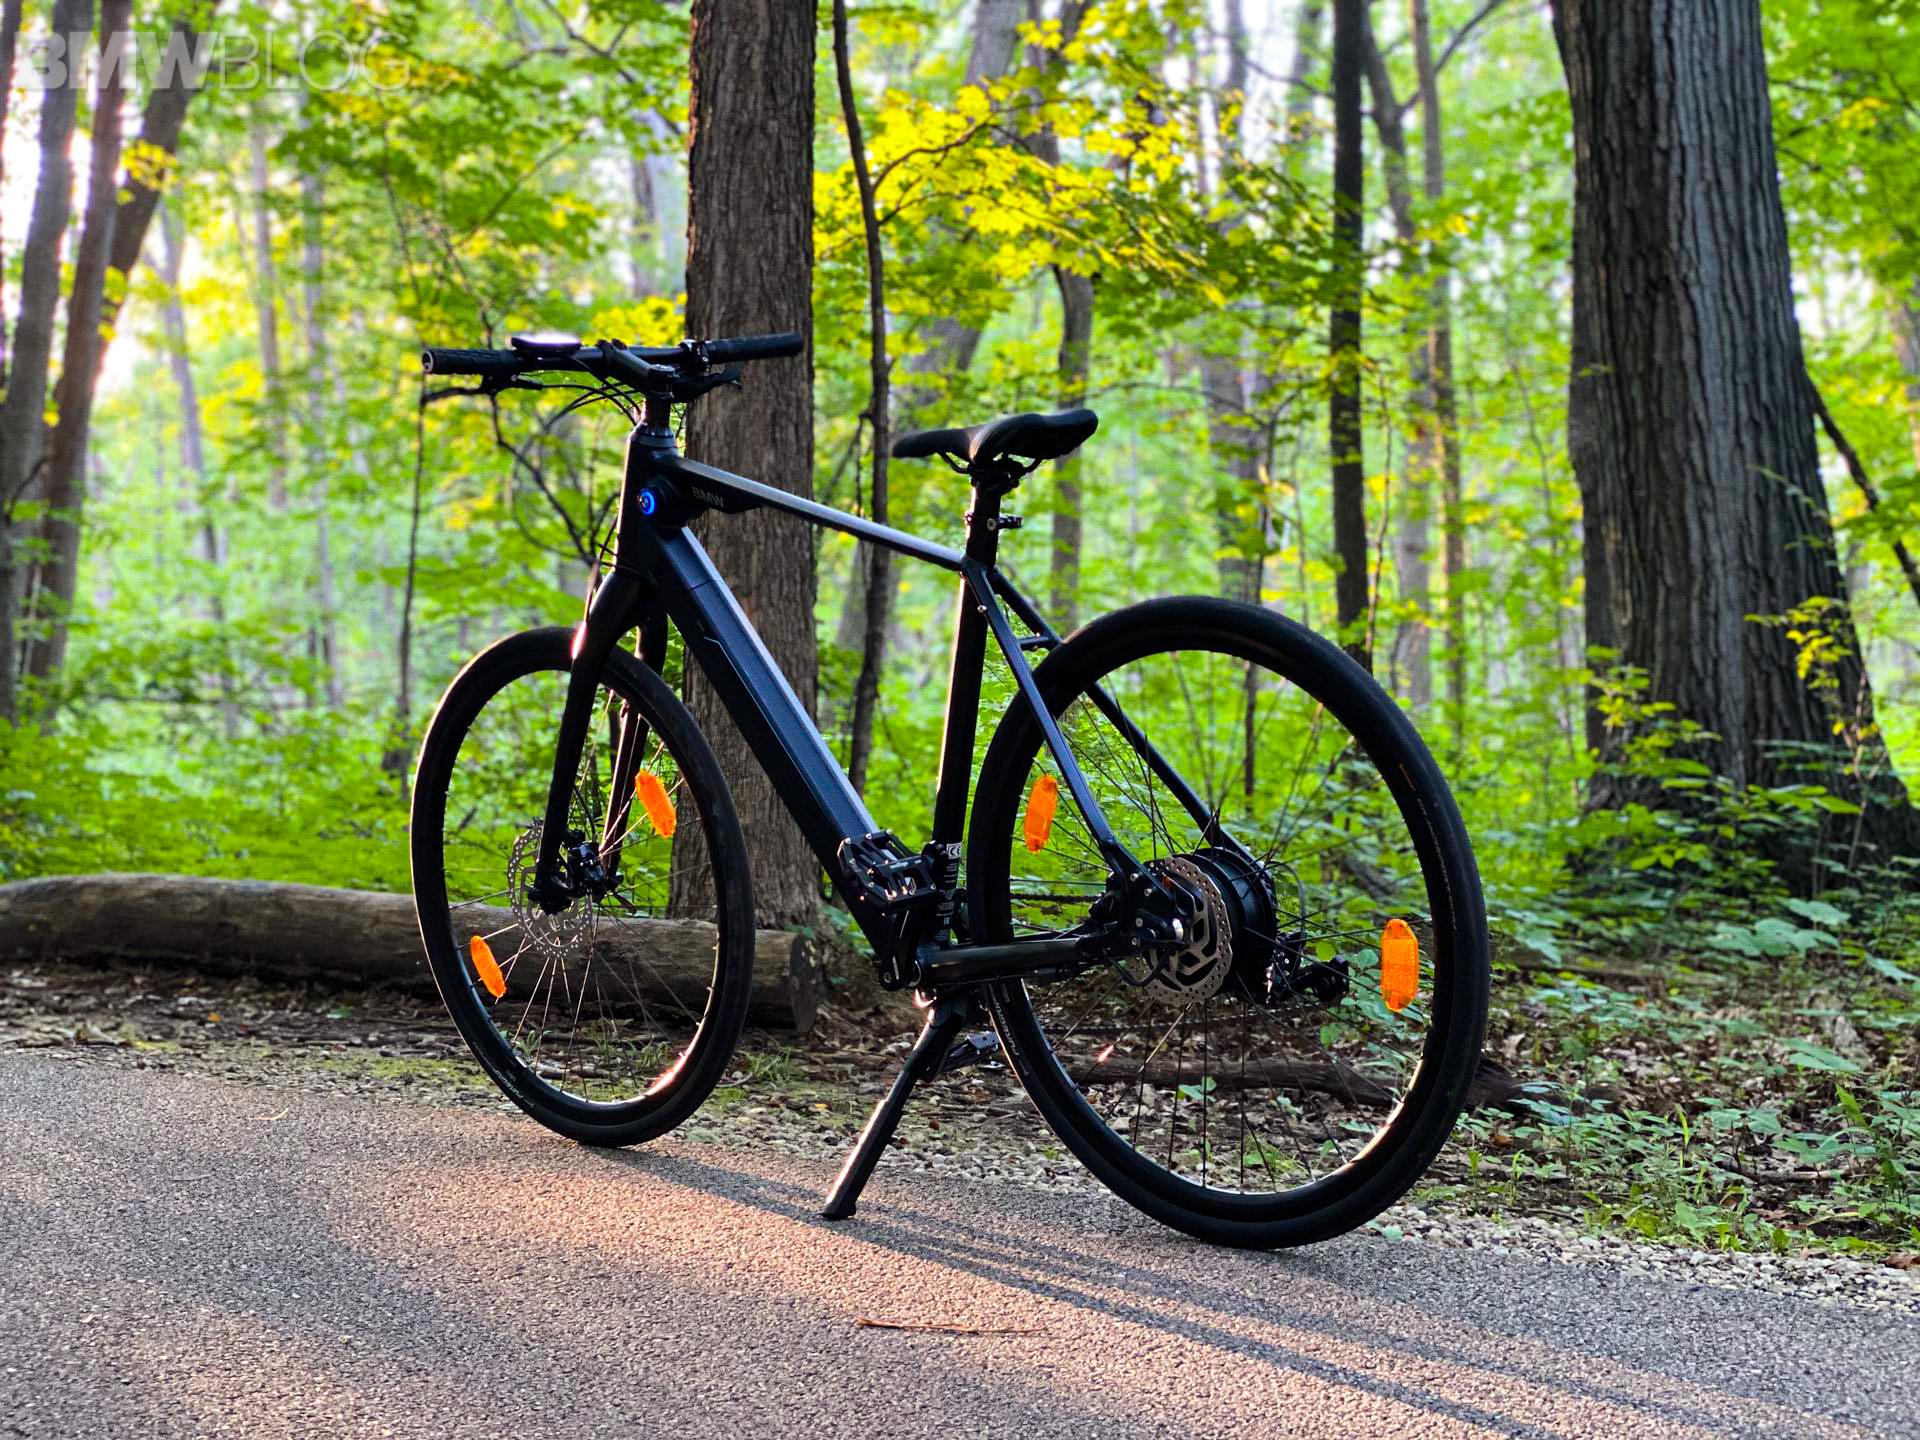 BMW Urban Hybrid E-Bike – Review and Ride Impressions